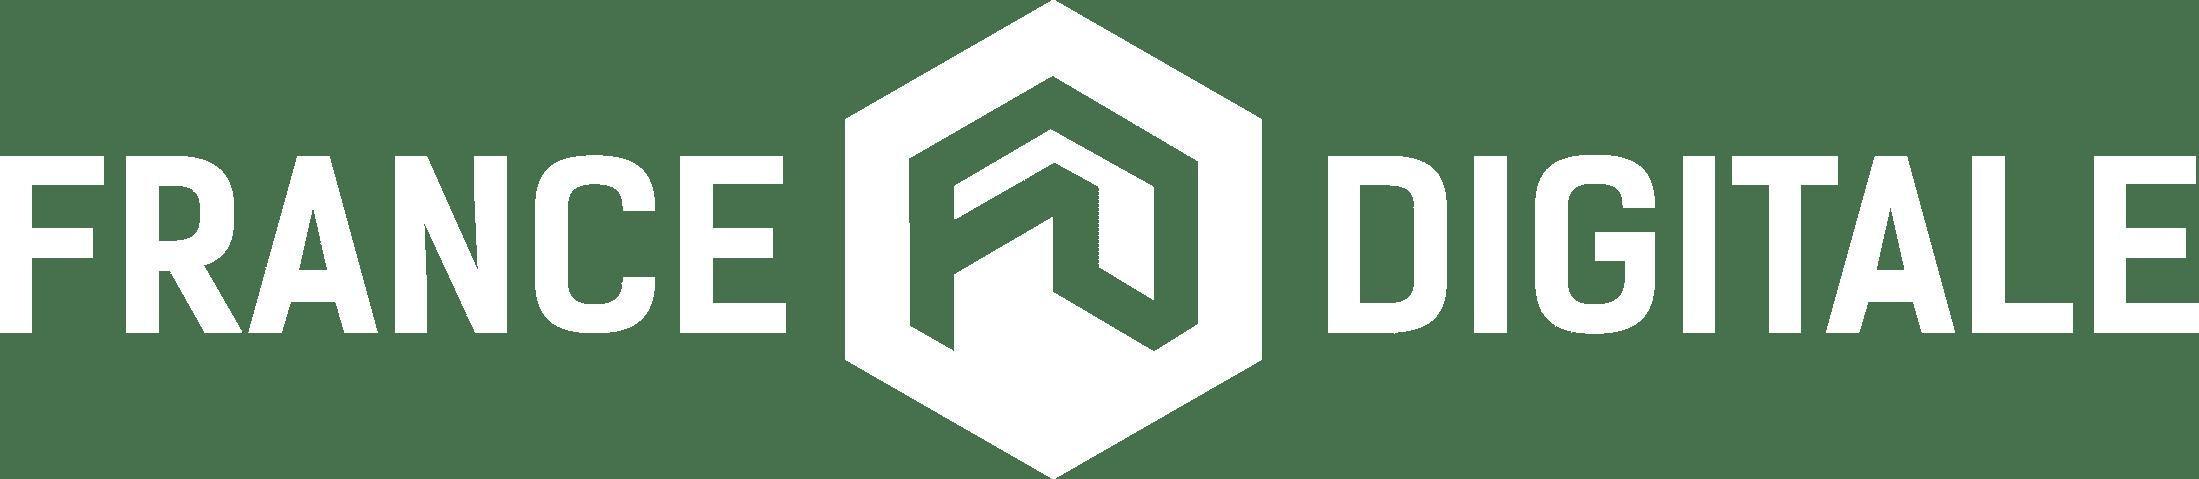 Logo de France Digitale